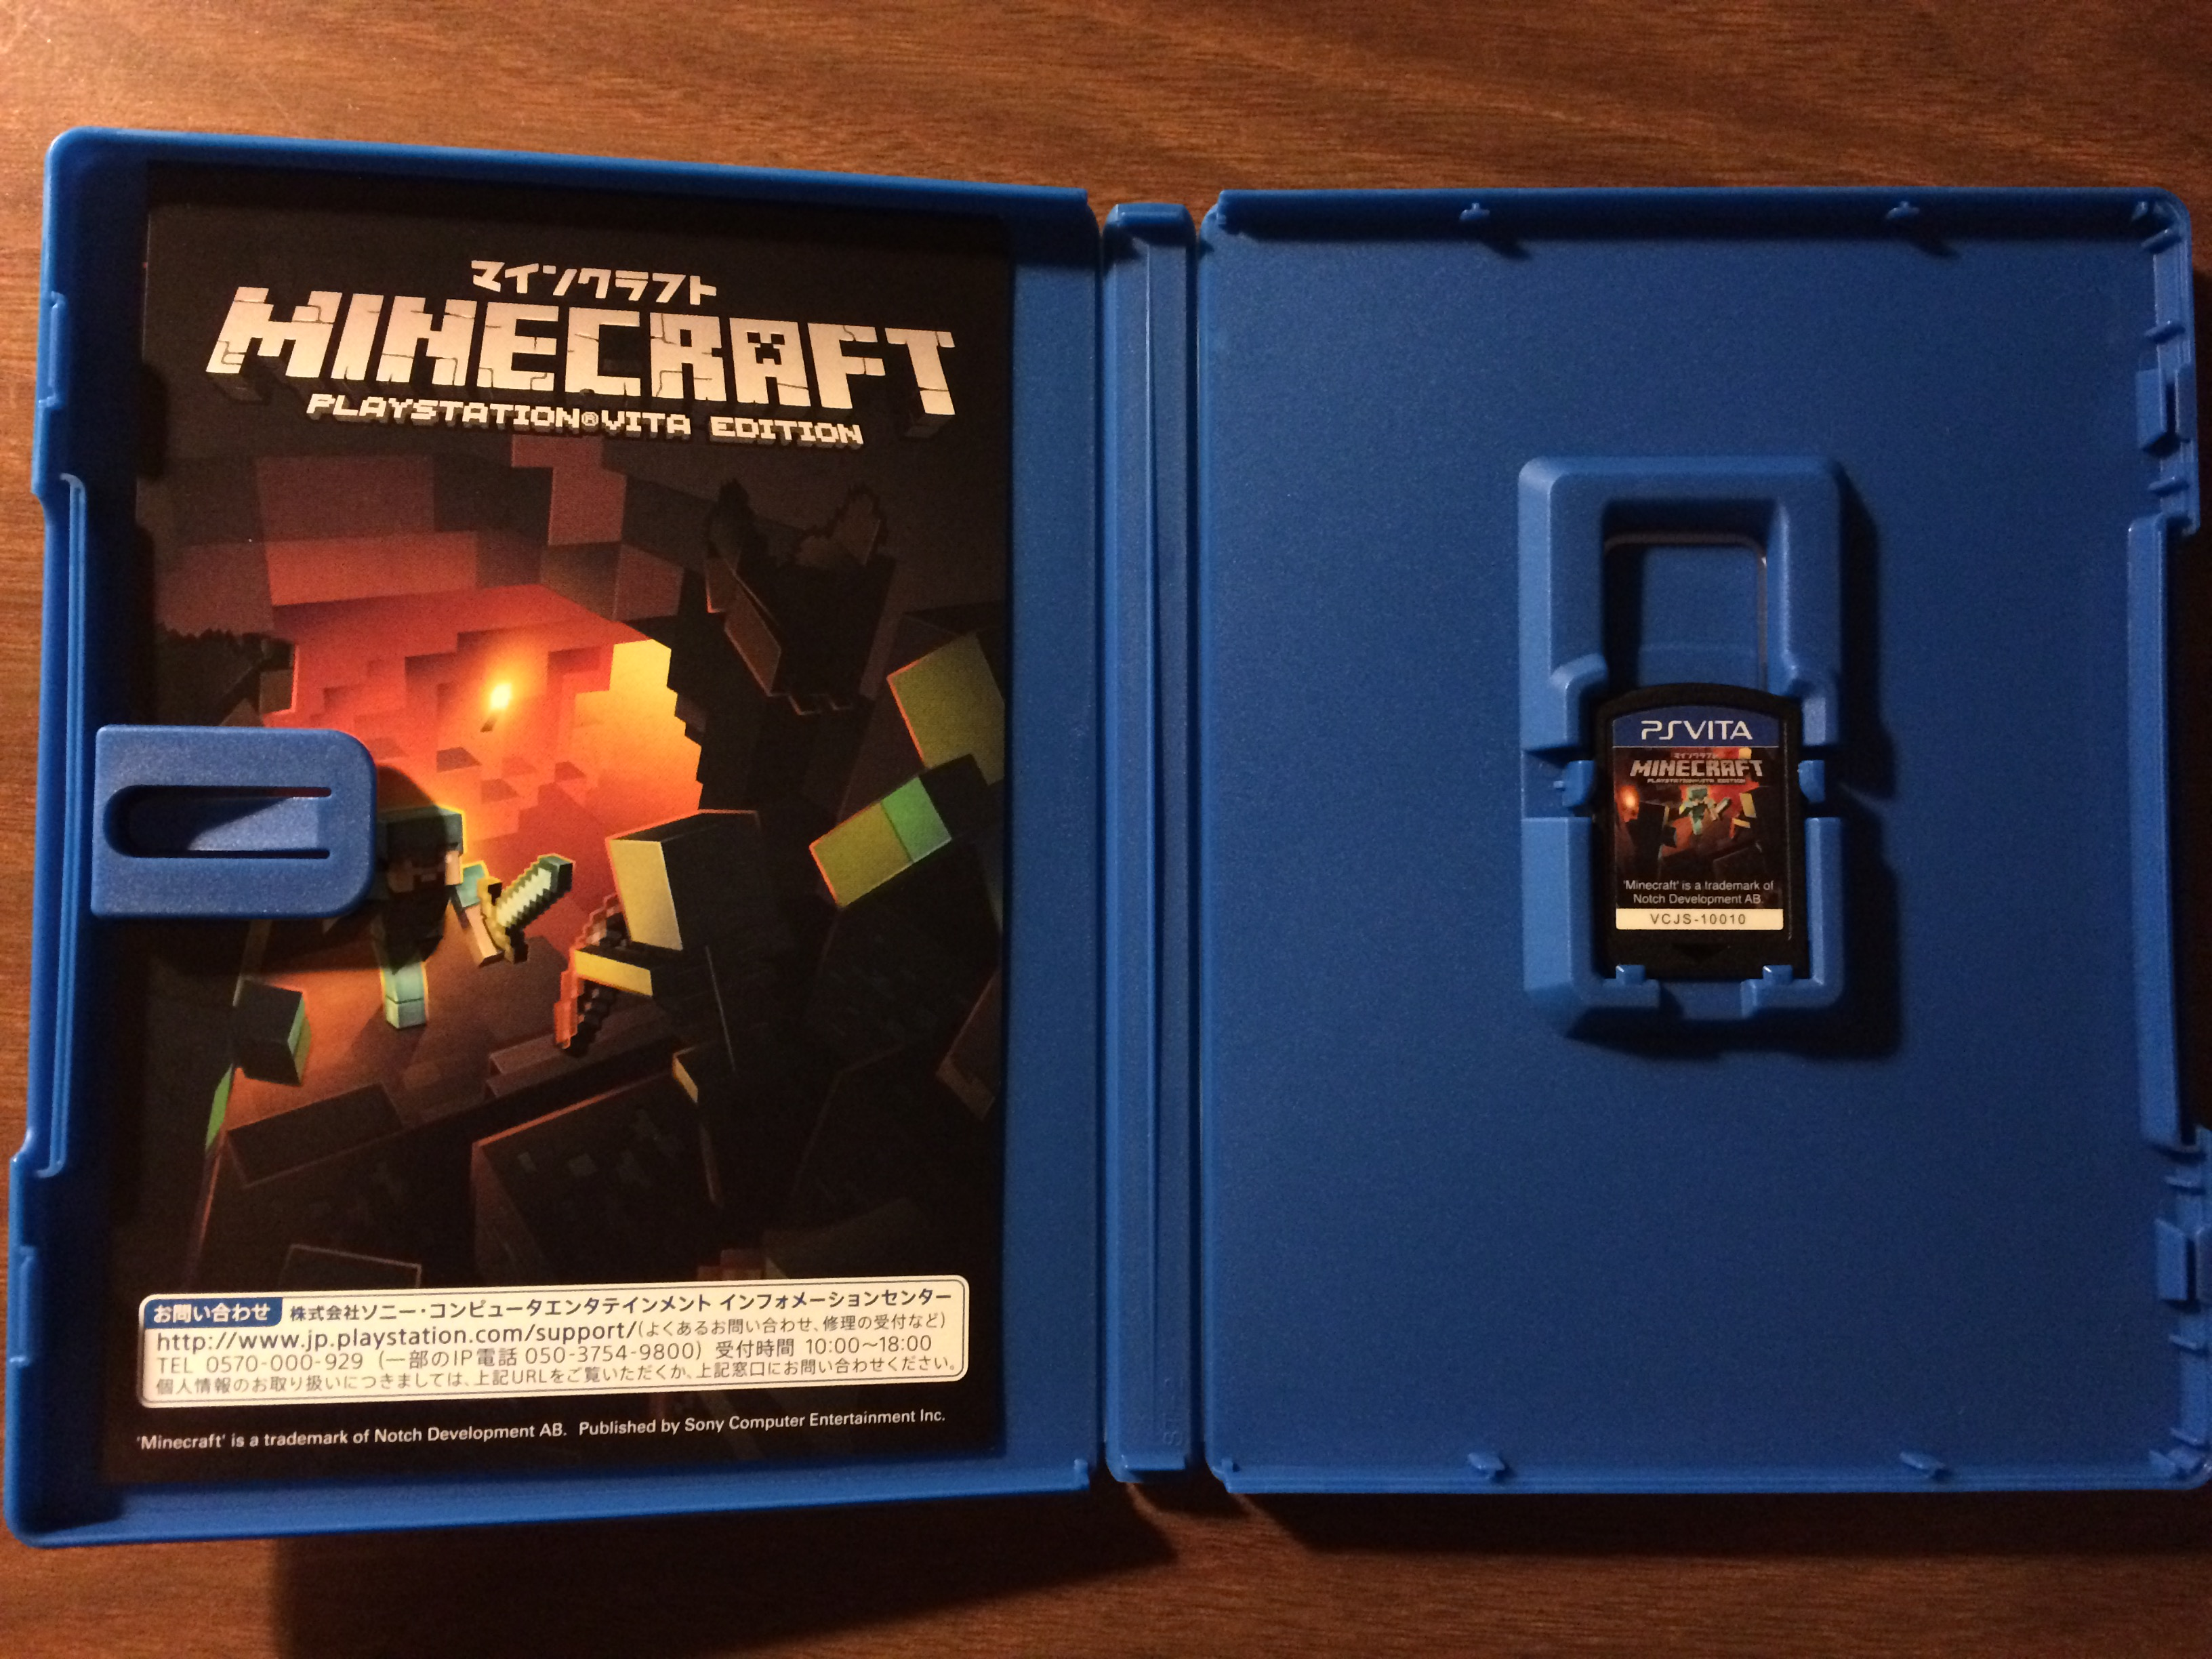 Sony Ps Vita Game Cartridge : Minecraft ps vita cartridge big star s